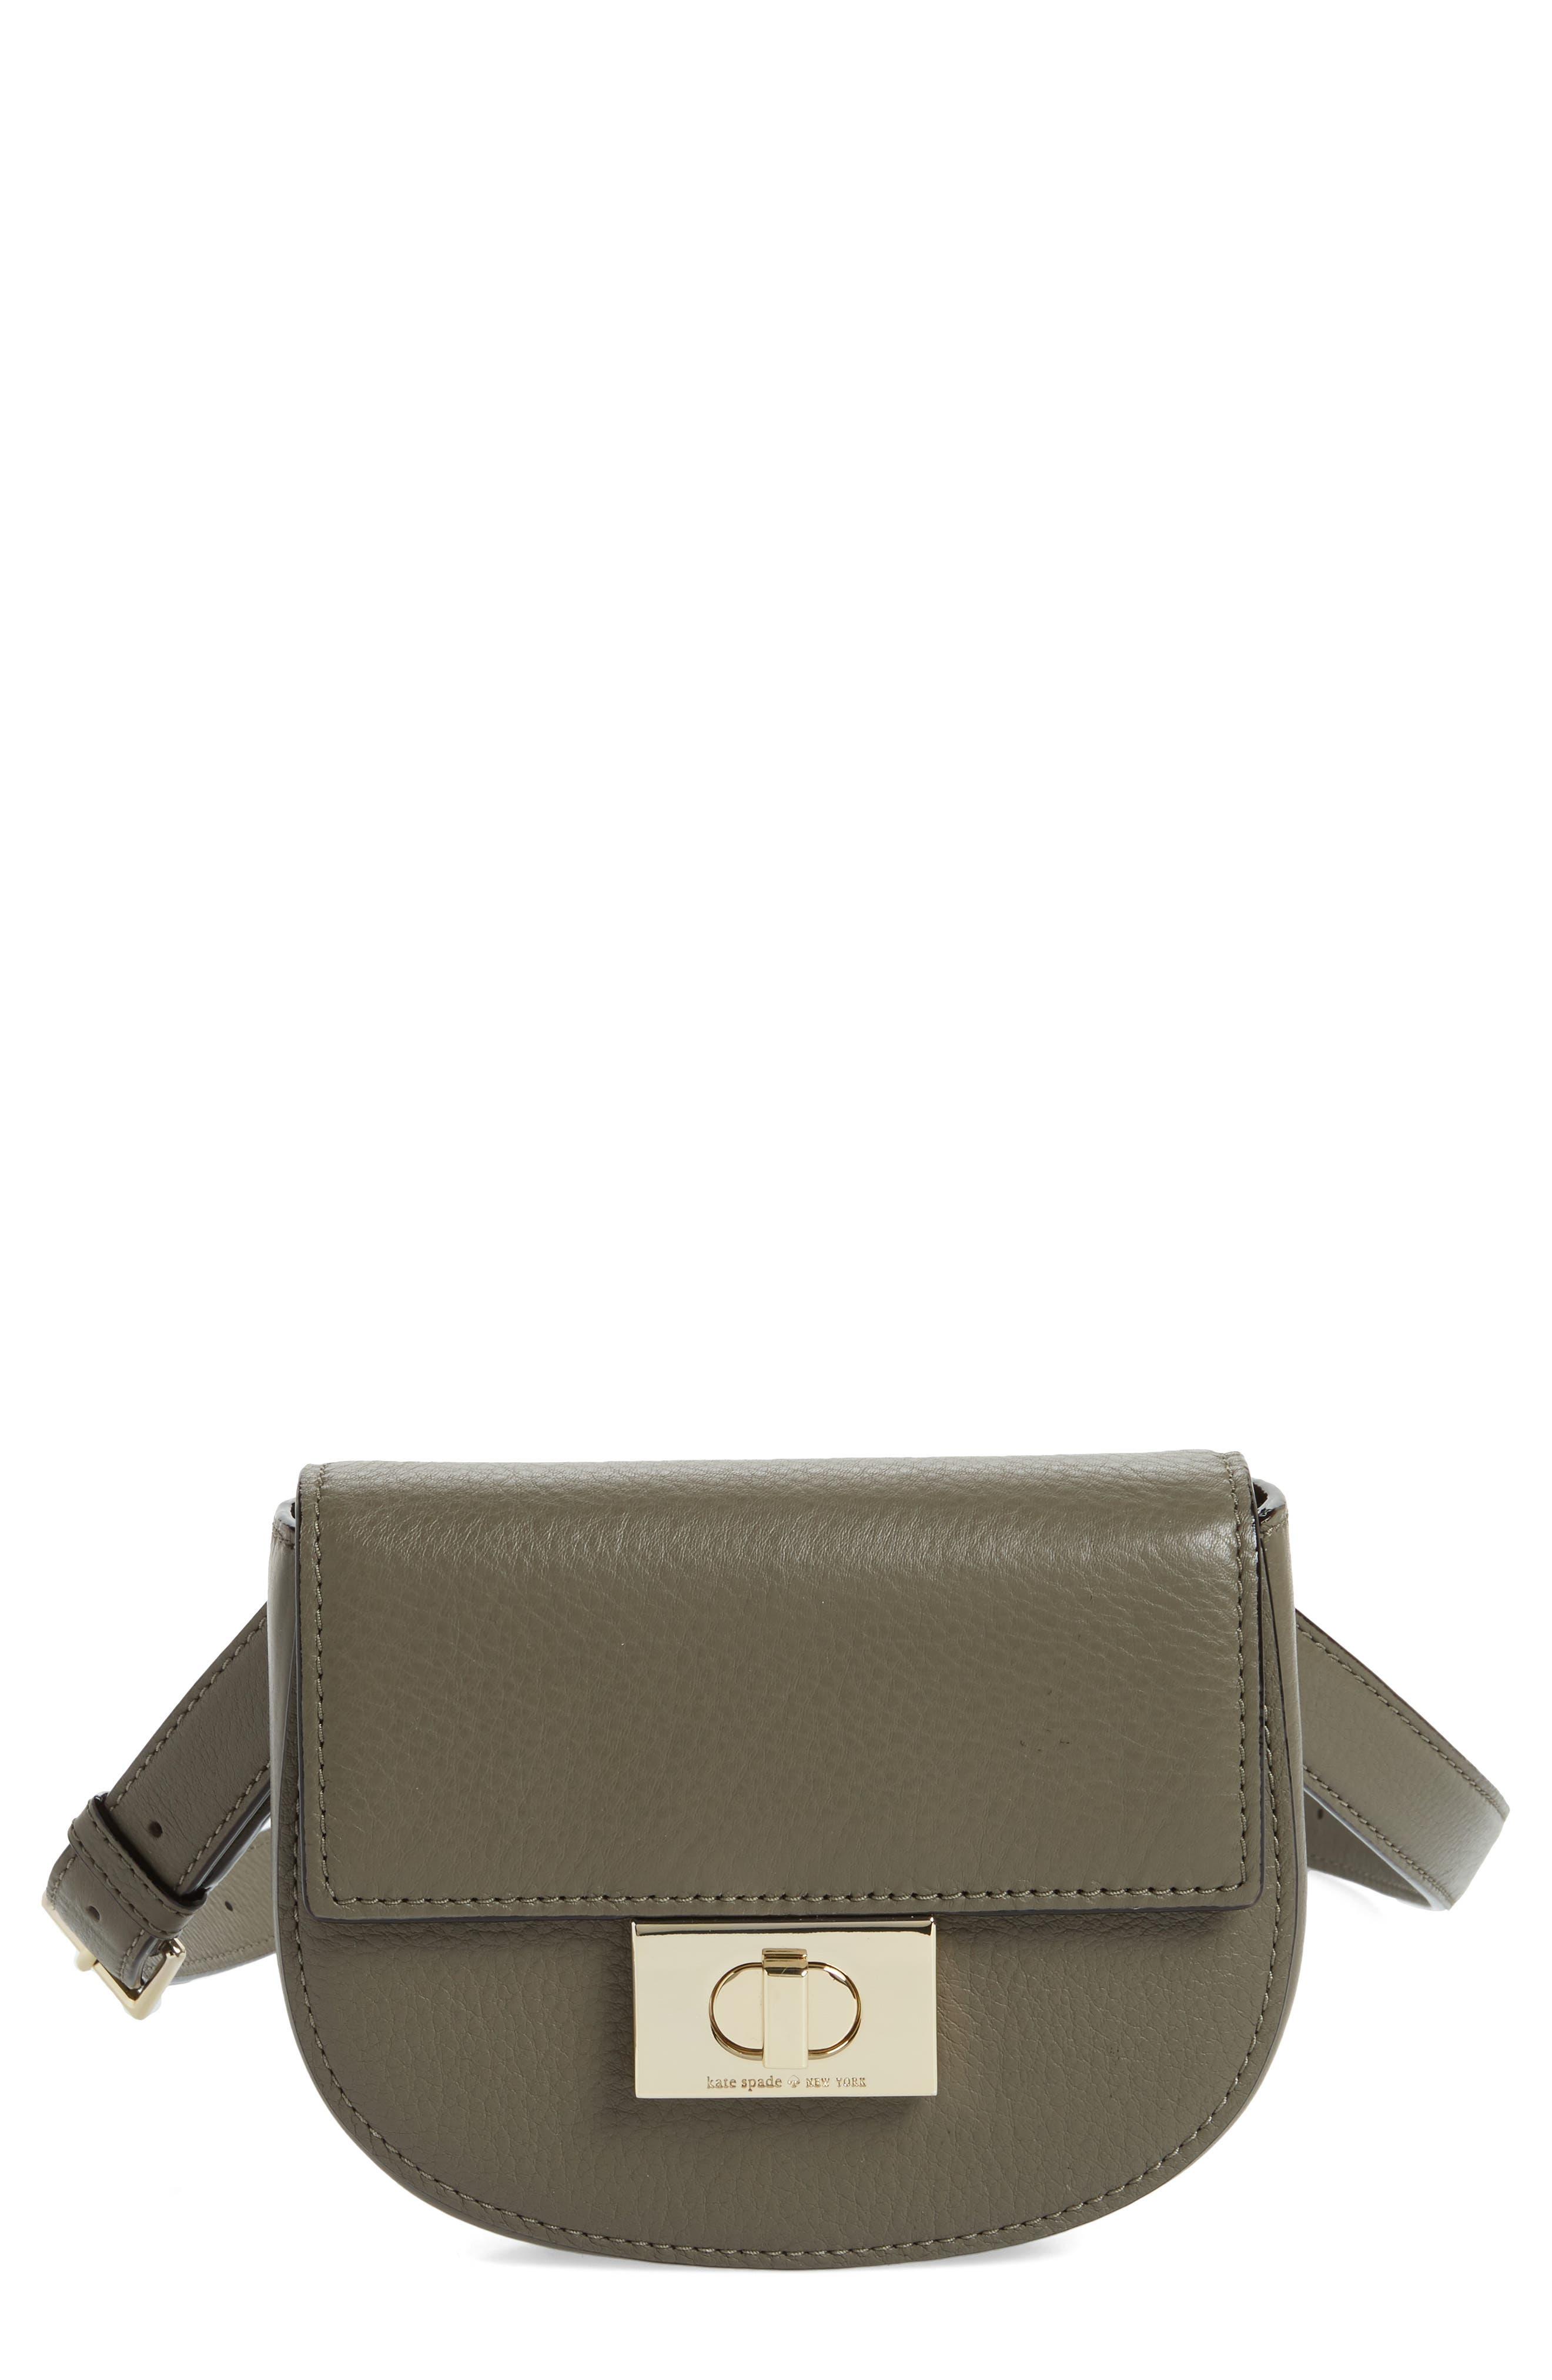 kate spade new york greenwood place rita leather belt bag